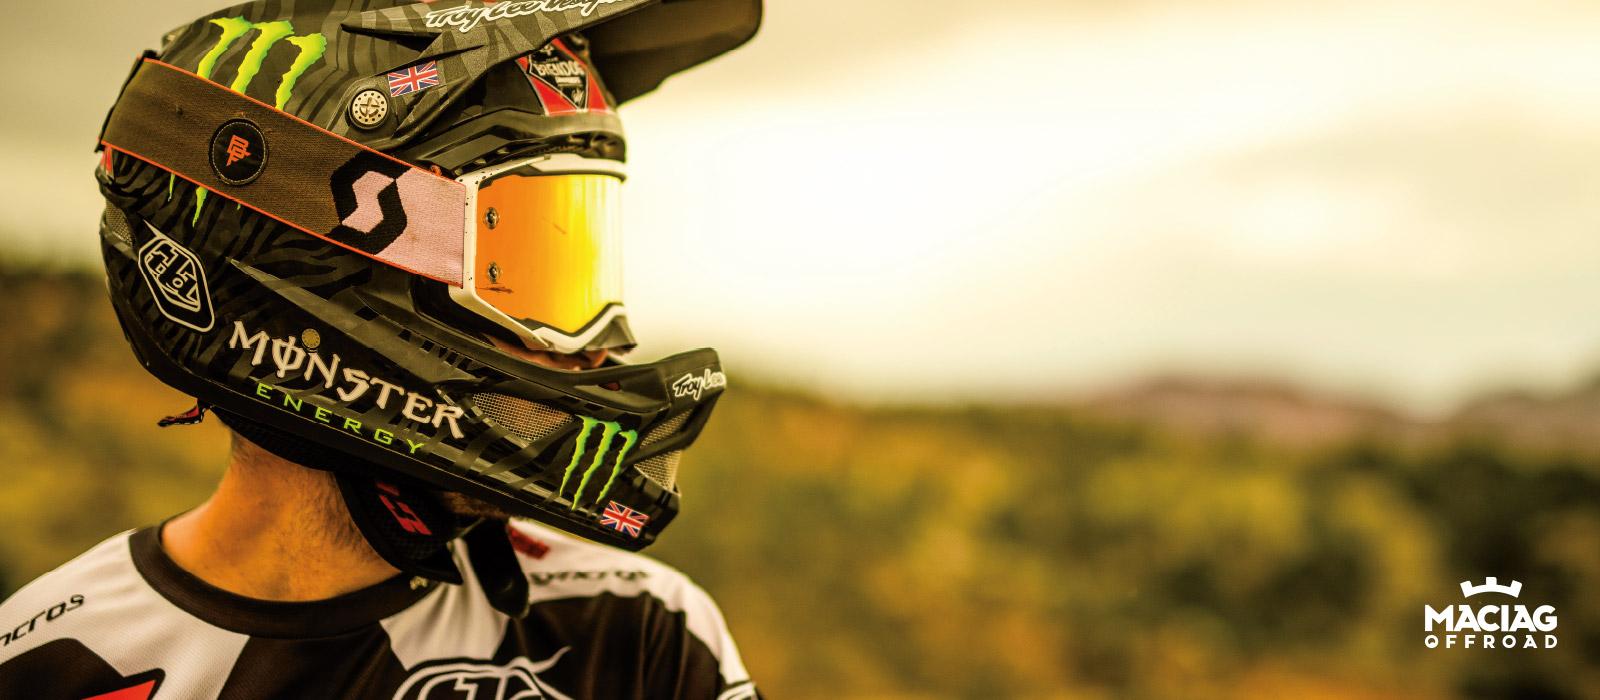 Troy Lee Designs Helmet >> Free Motocross & Mountainbike Wallpaper | Special | Maciag Offroad